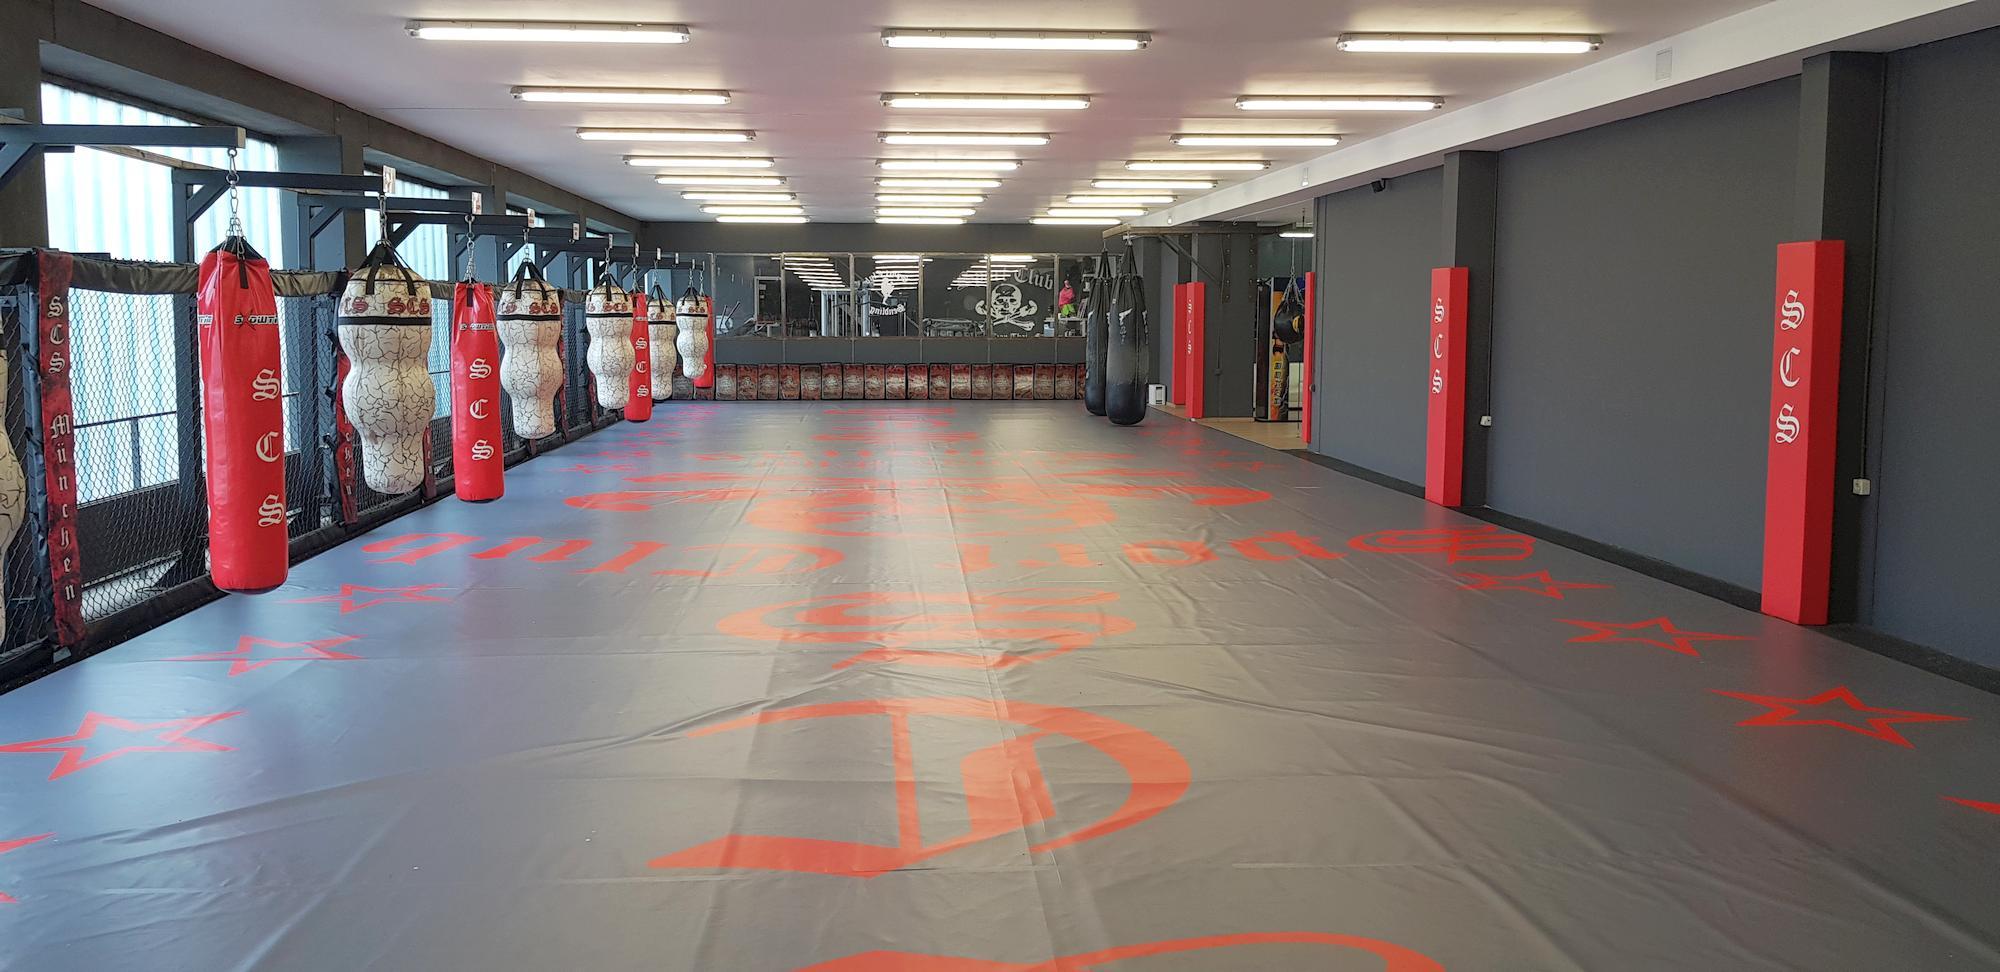 Sportclub KickboxenK ampfsport Kids